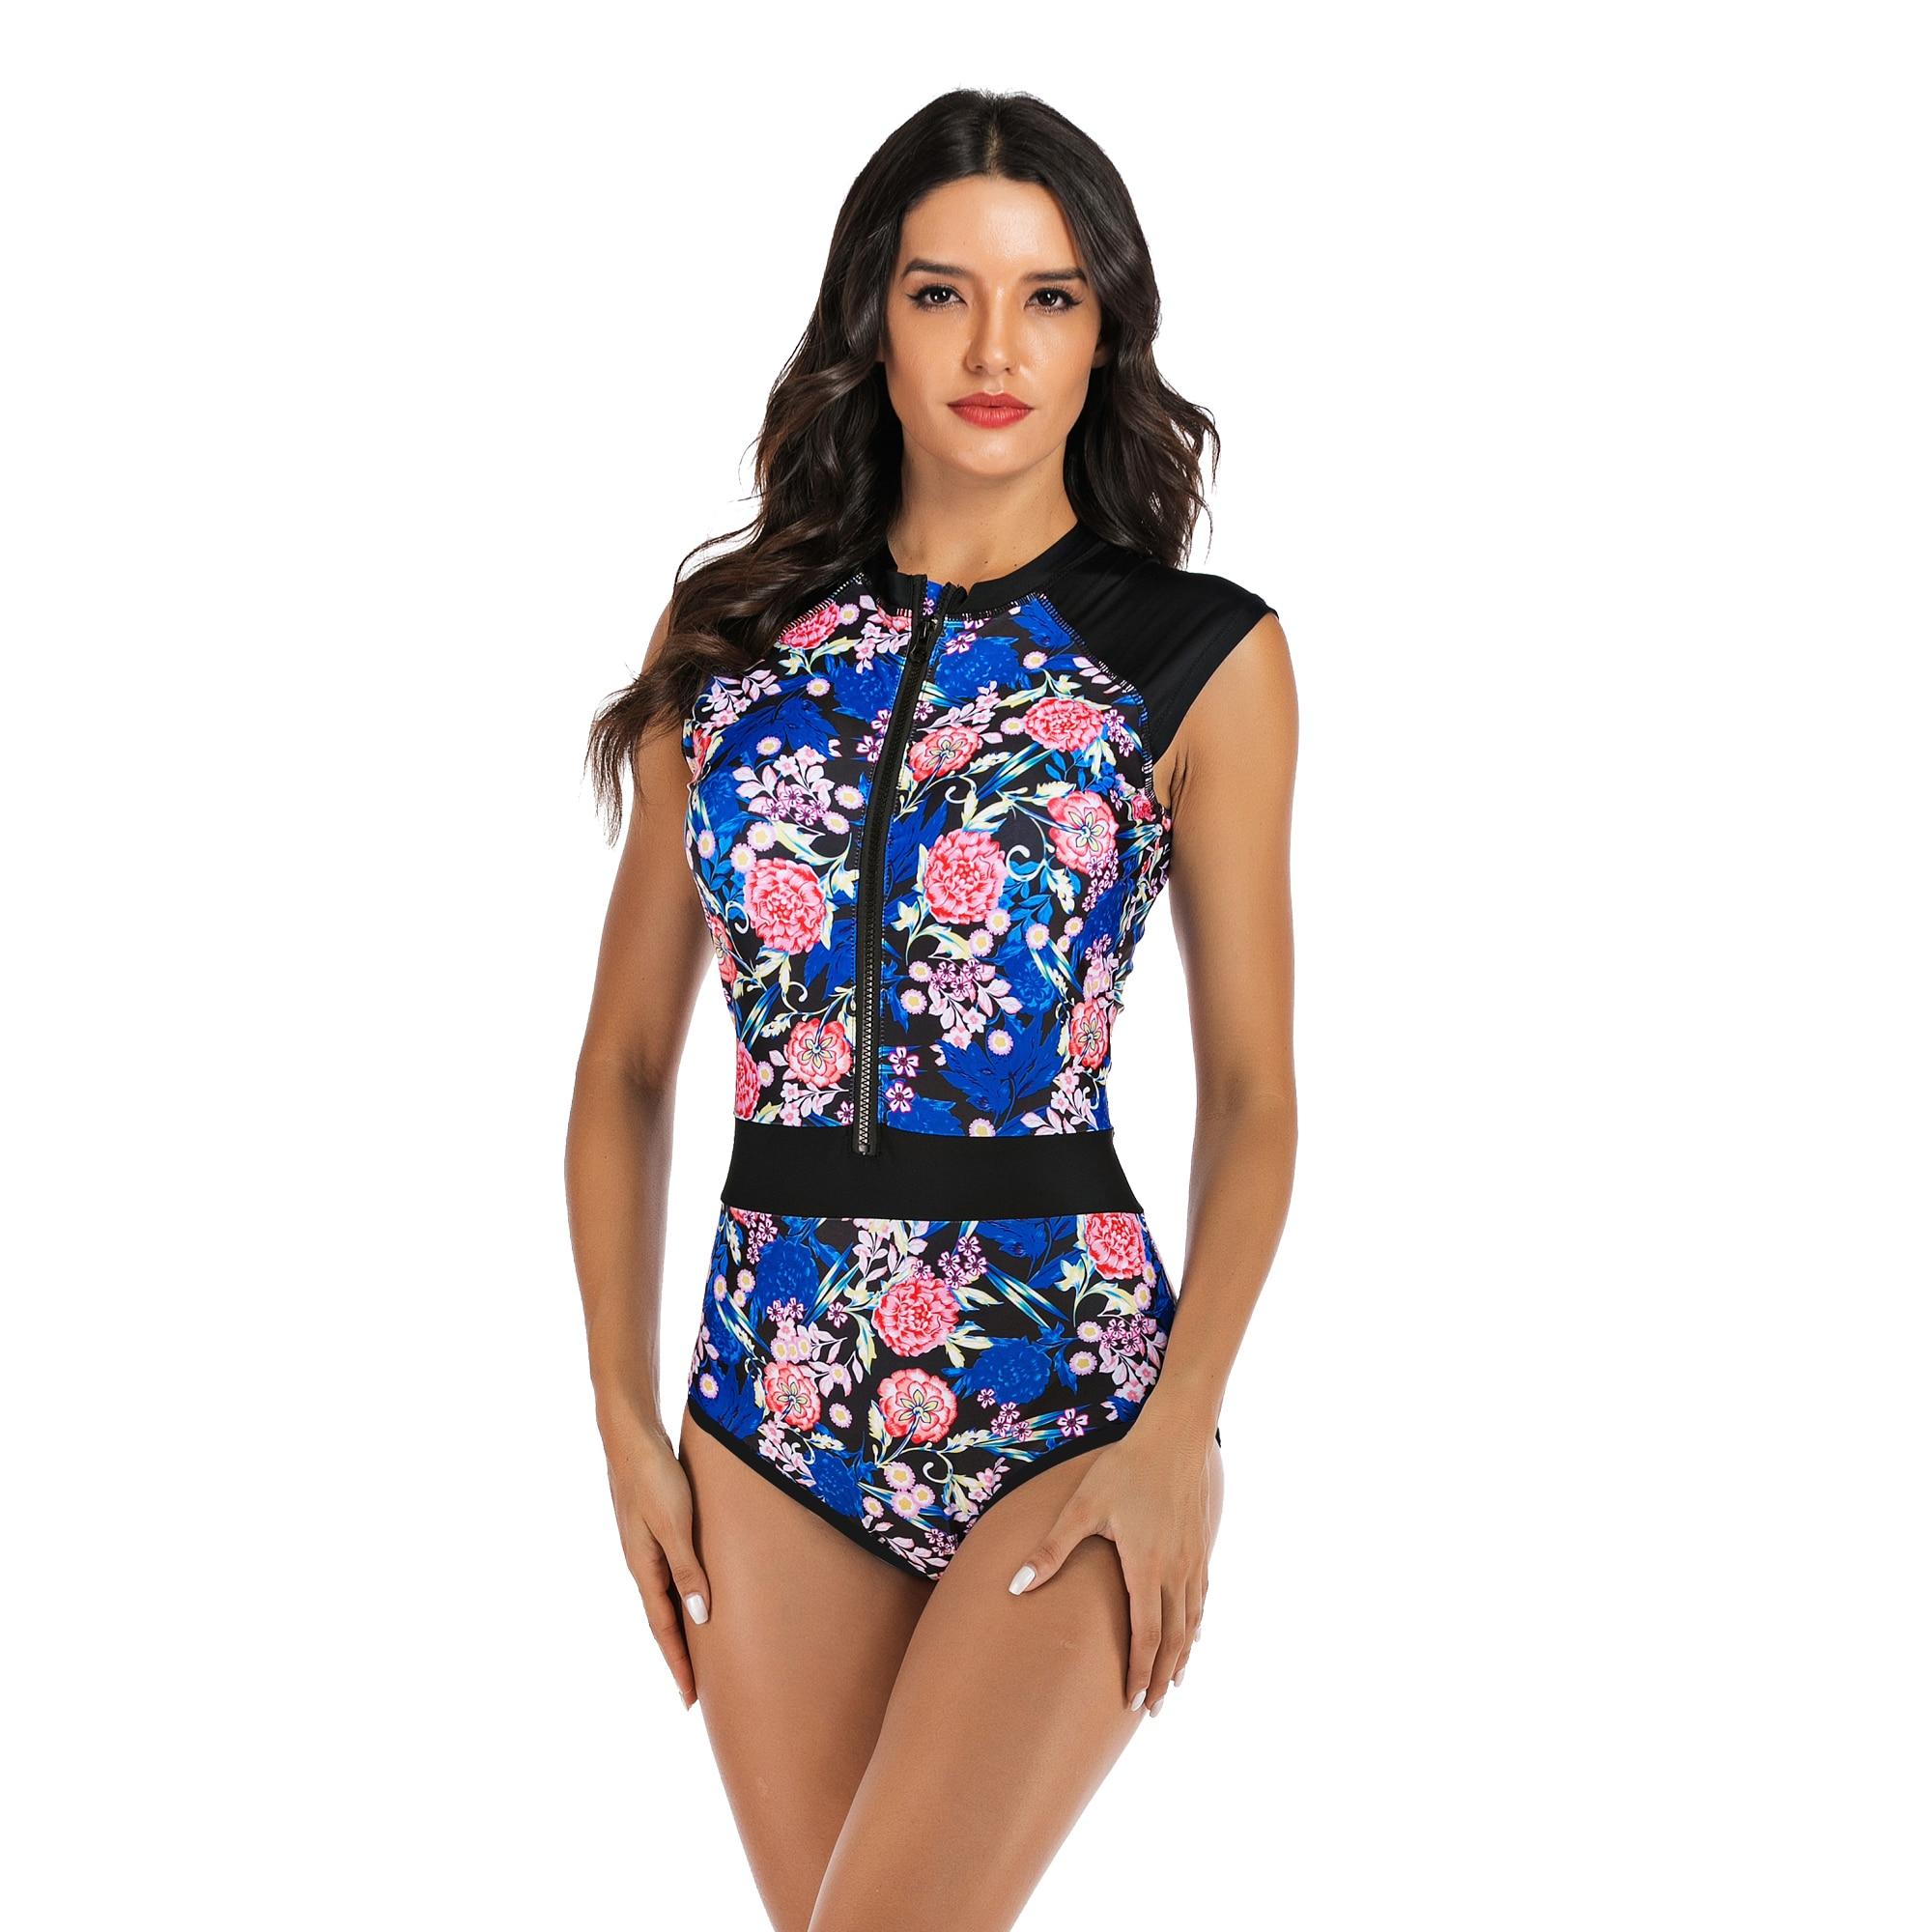 H3673dc4486cf4da3a2dff2b371a3d336Z Sexy Swimwear Women micro bikini mujer Swimsuit Women swimming suit Bikinis Set Vintage Beach biquinis feminino